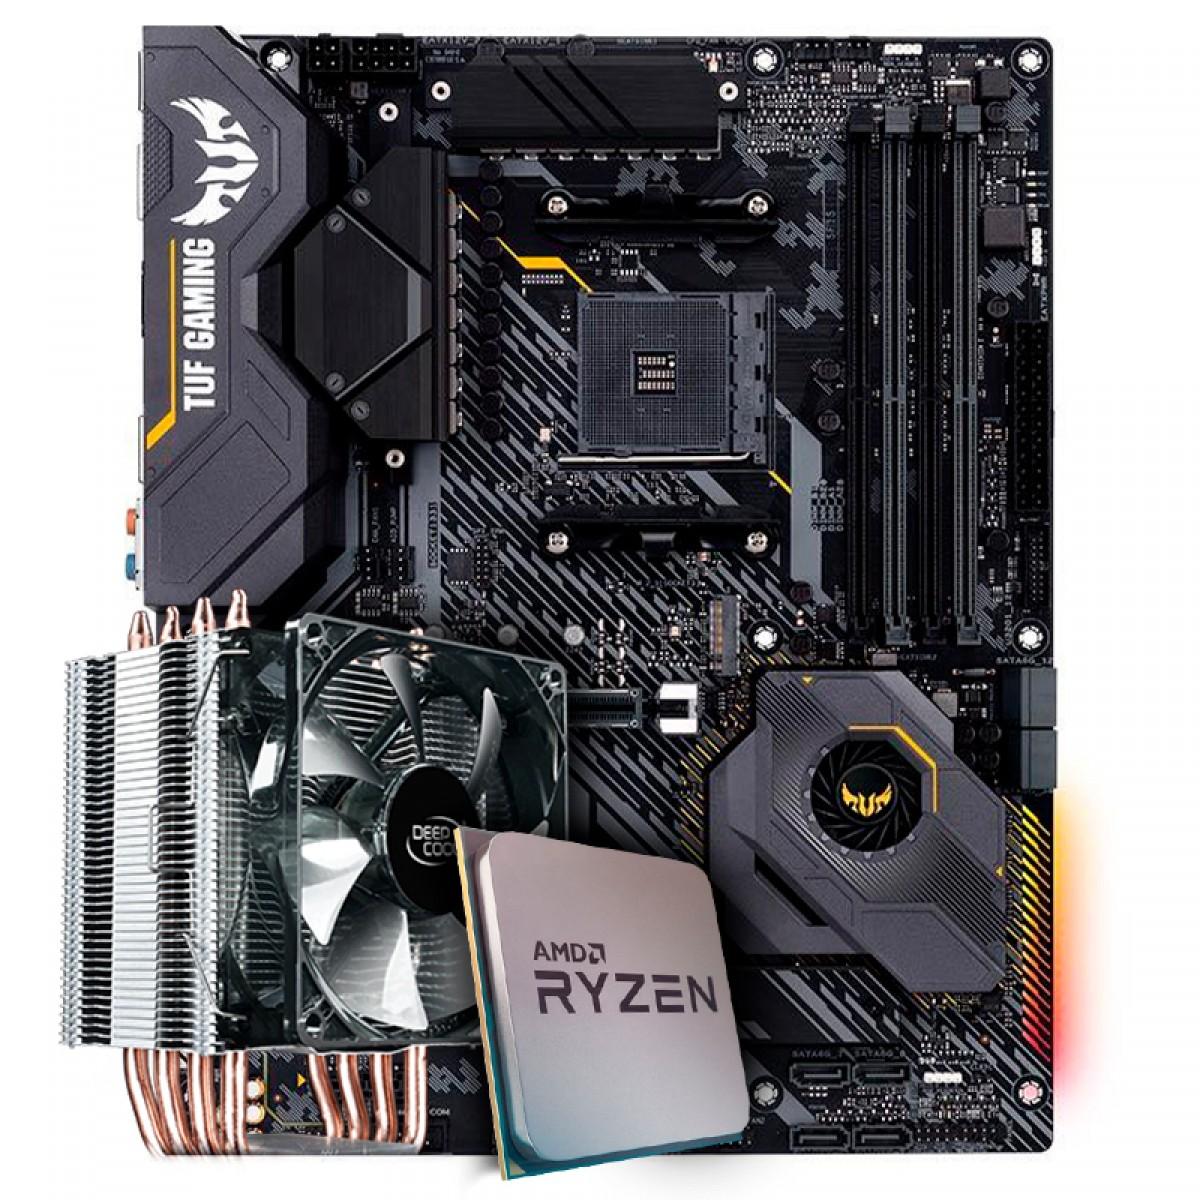 Kit Upgrade Placa Mãe Asus TUF Gaming X570-Plus AMD AM4 + Processador AMD Ryzen 7 3800x 3.9GHz+ Cooler Deepcool Gammaxx